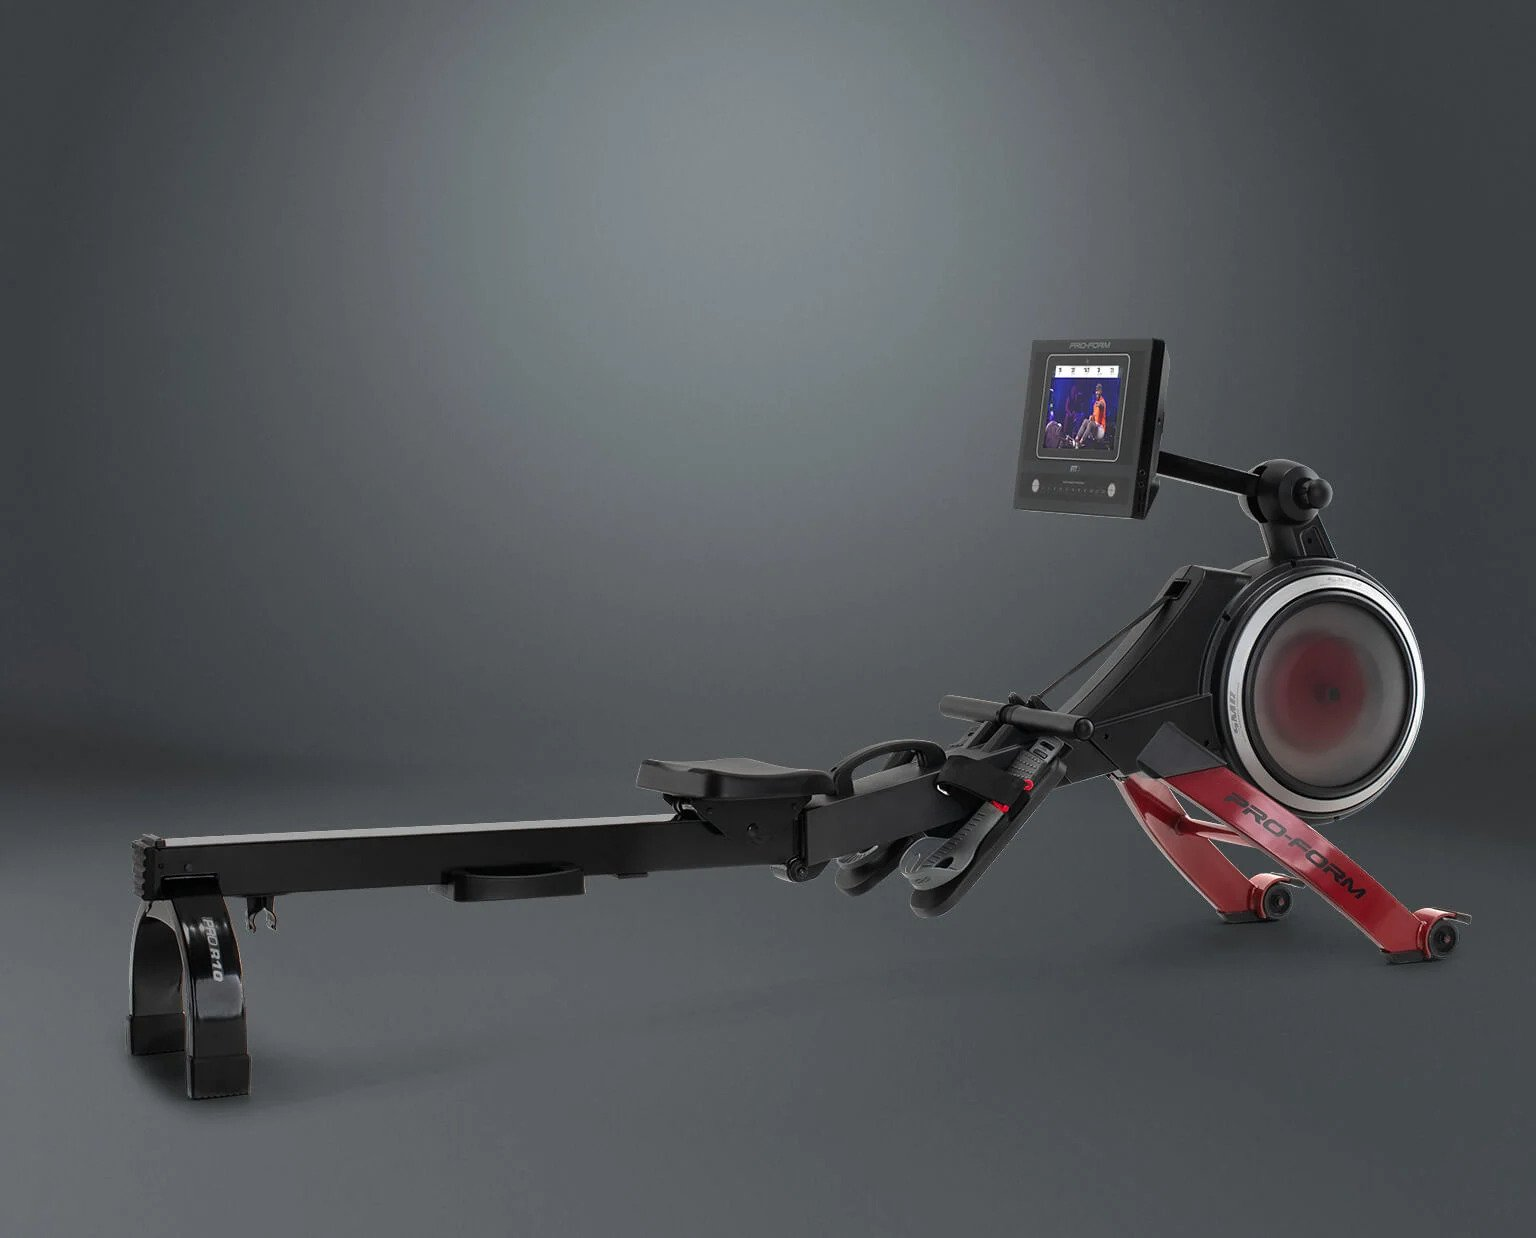 ProForm Pro R10 Rower - New 2021 Model